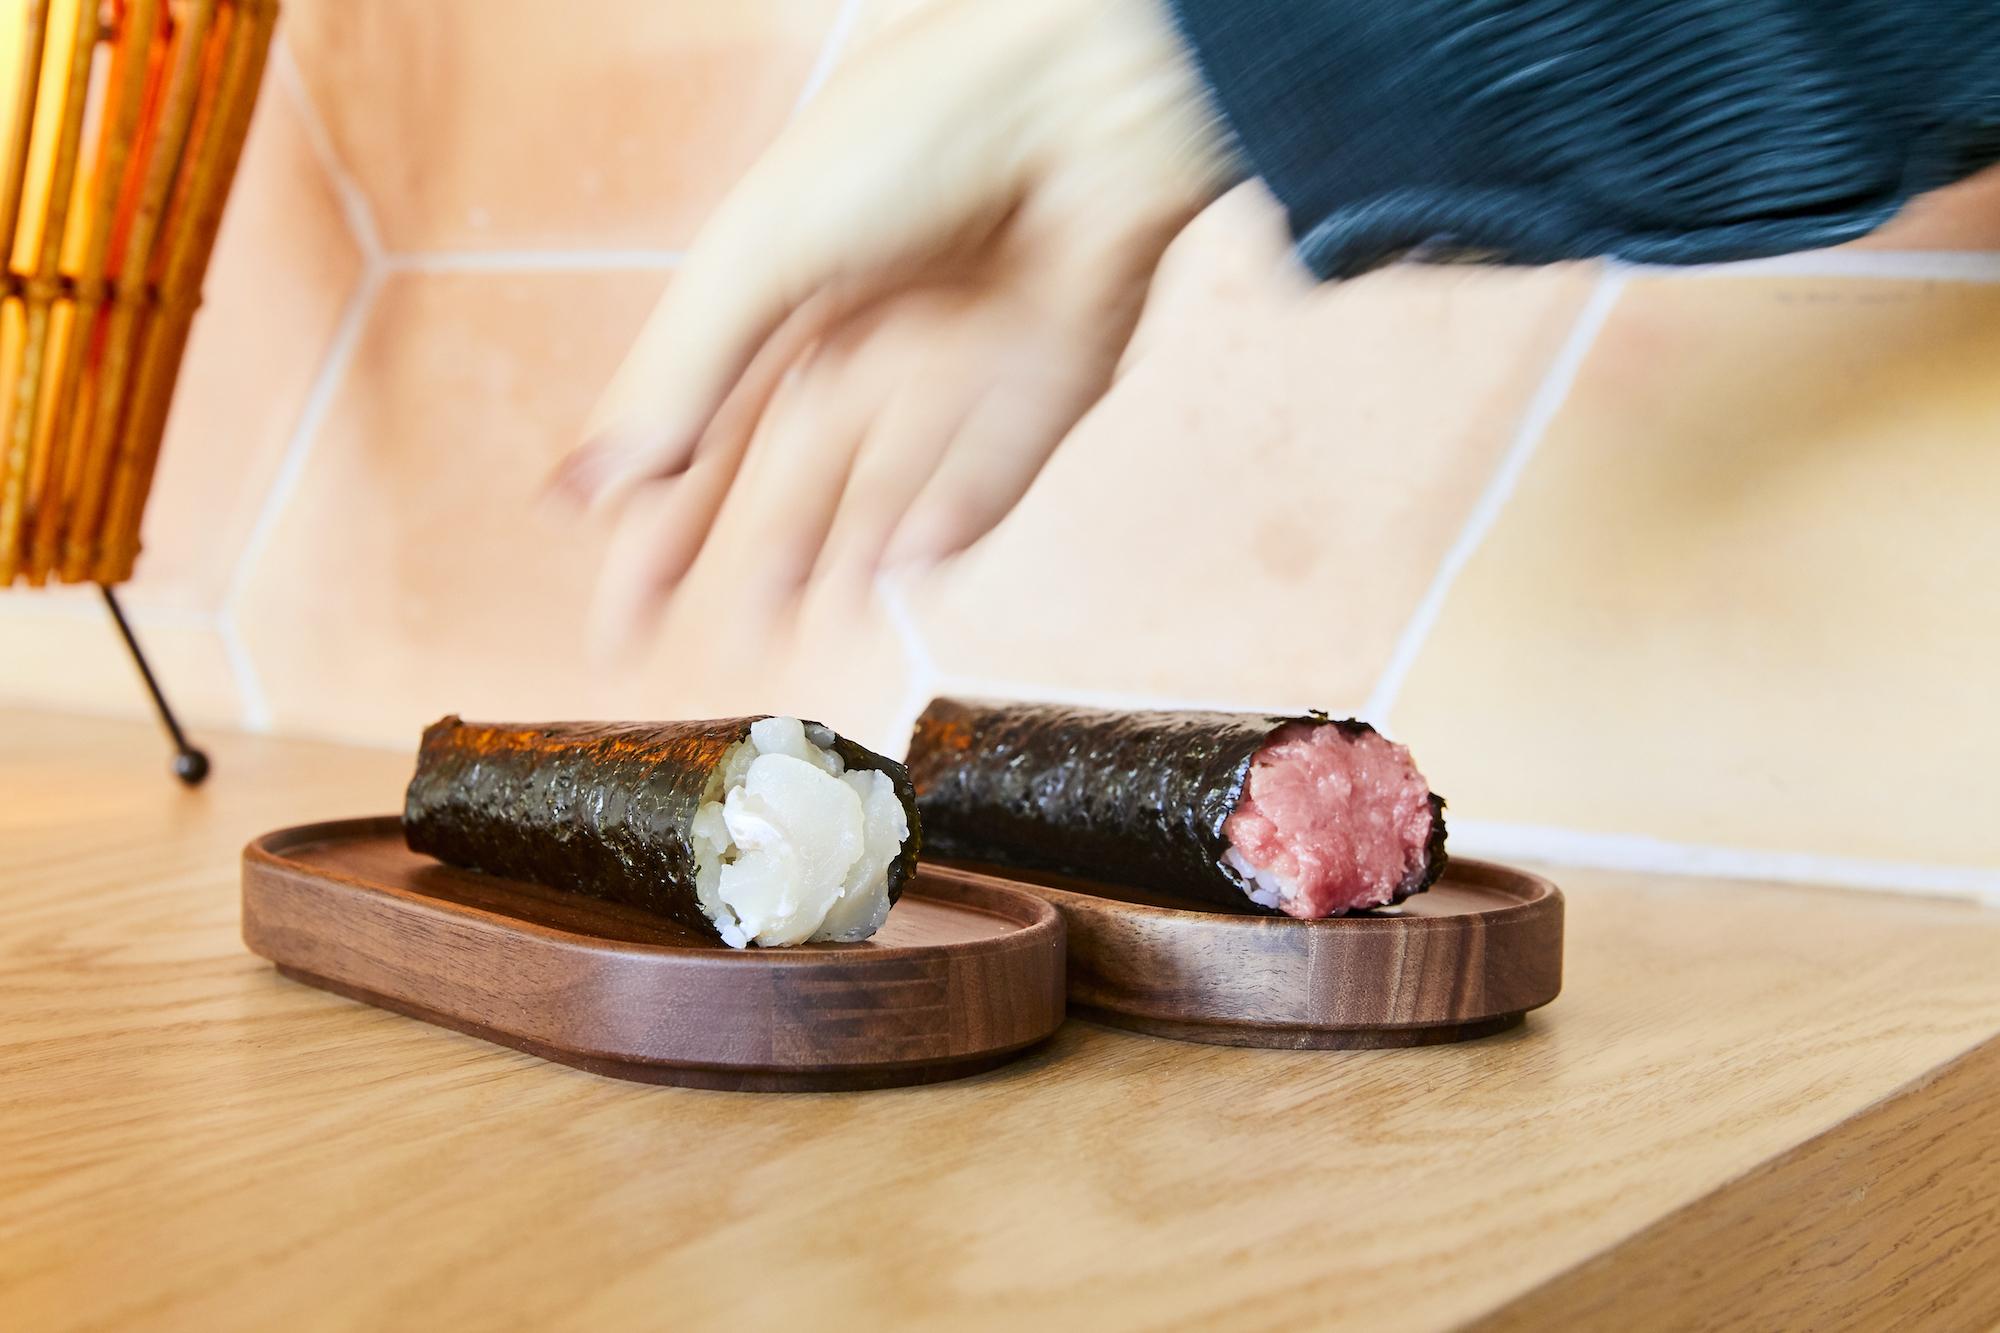 Prominent LA Sushi Chef Serves Hand Rolls in Los Feliz Tomorrow